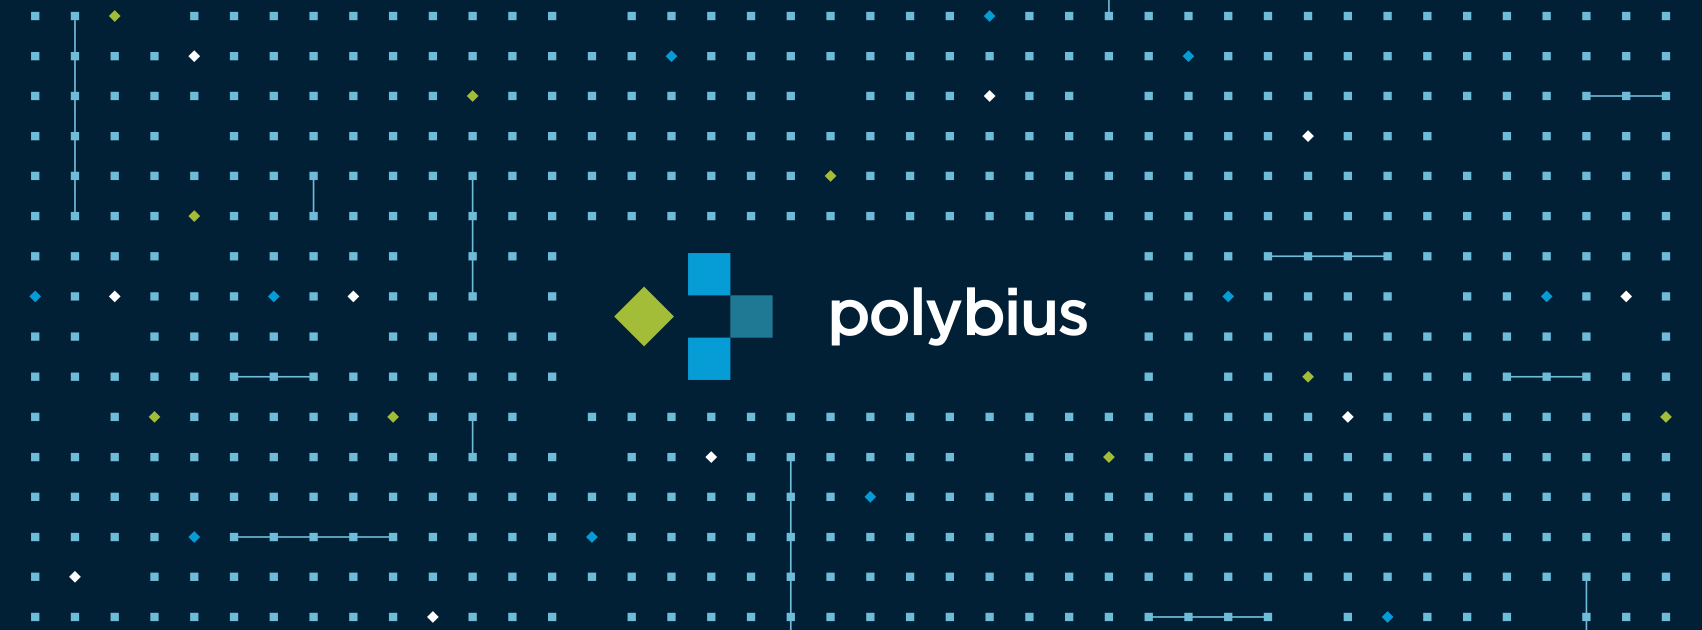 polybius-banca-blockchain